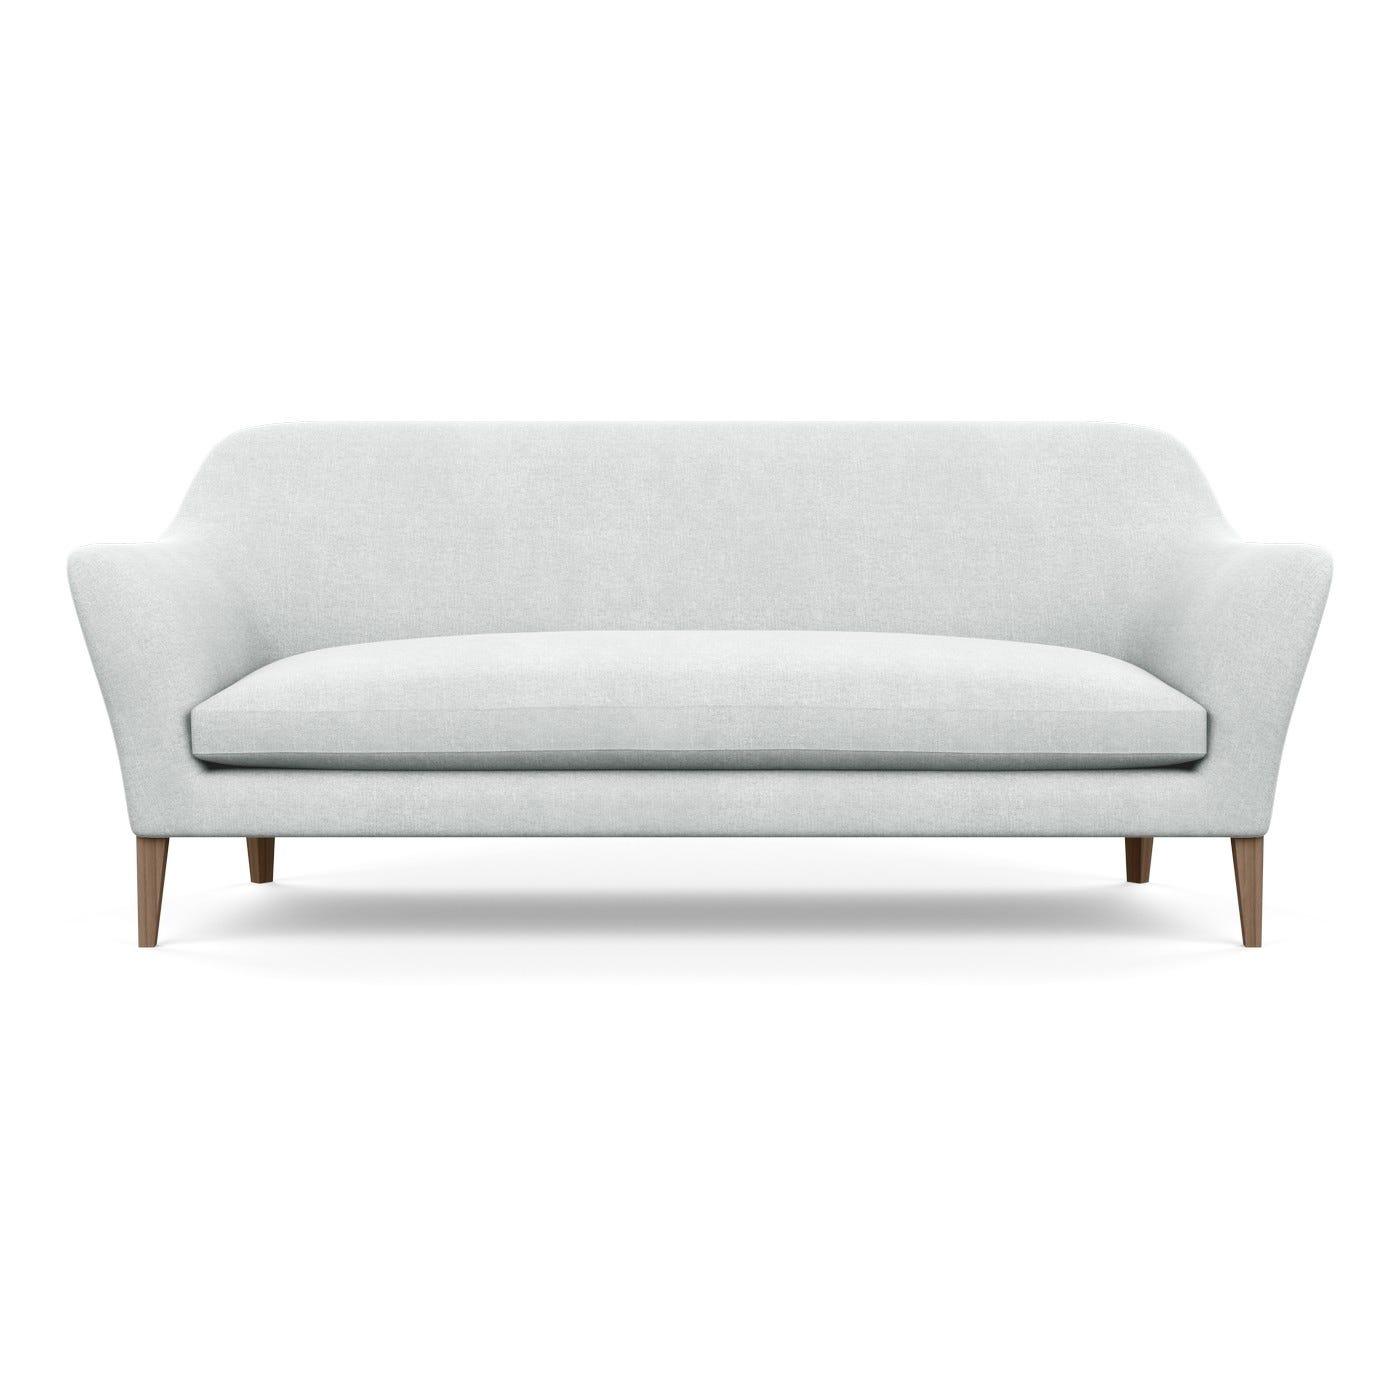 Wallis 4 Seater Sofa Broad Weave Tin Walnut Feet